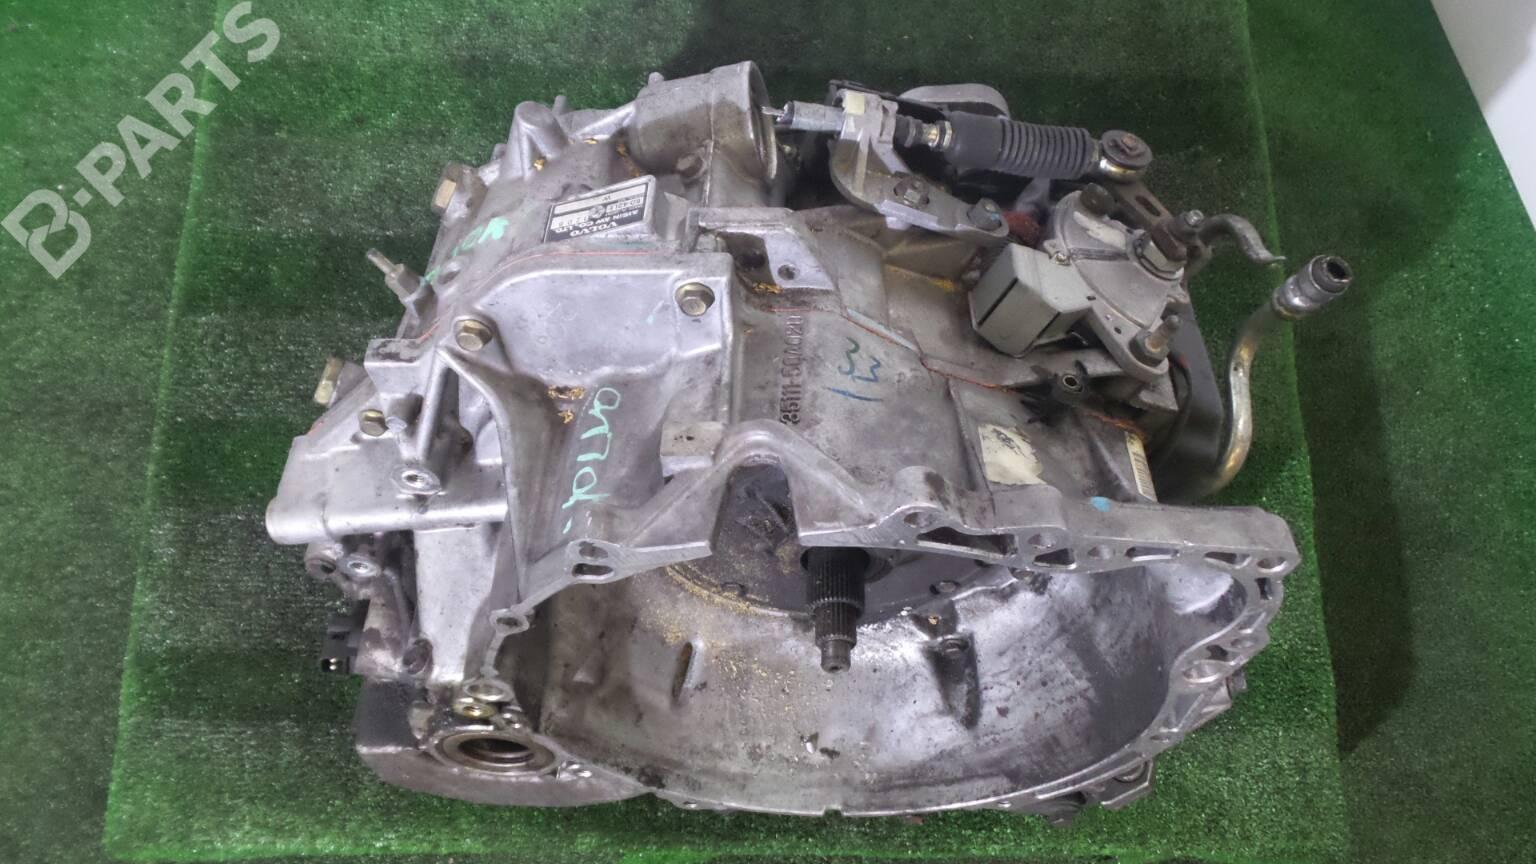 Automatic Gearbox Volvo 850 Ls 25 123091 1994 Engine Schematics 50 42le 1208560 254 Doors